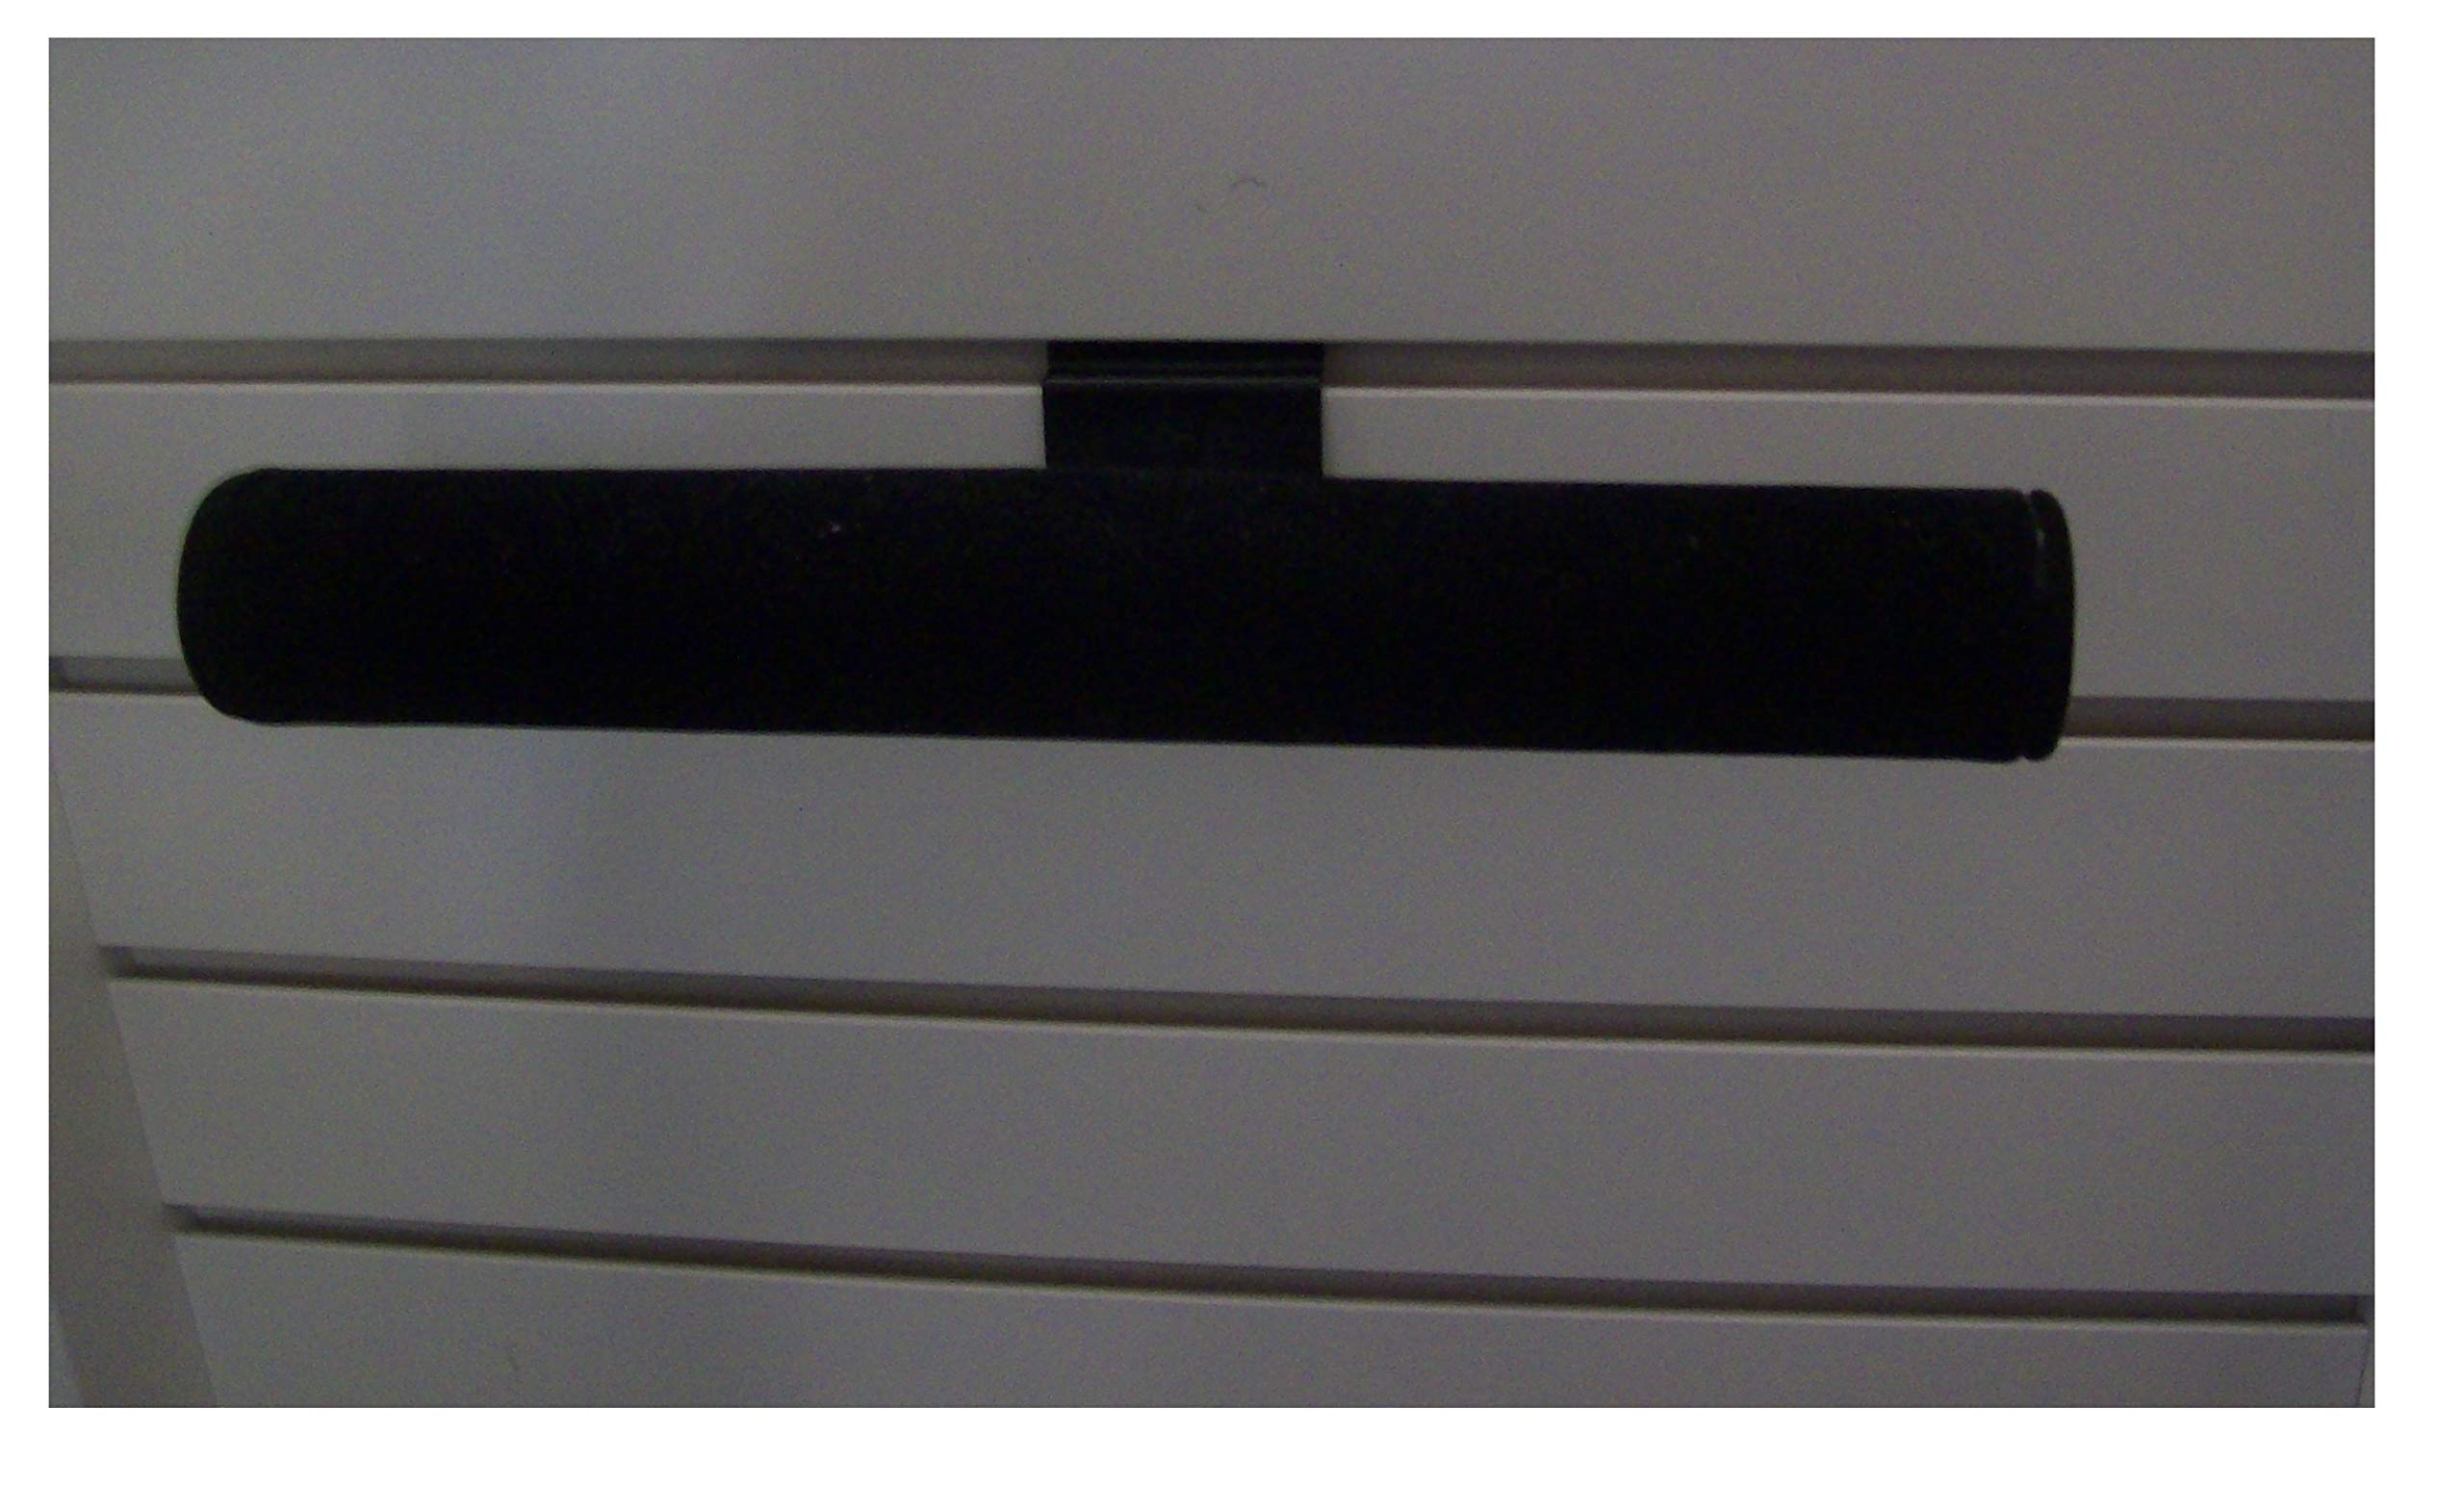 24 Slatwall T Bar Jewelry Displays Black Velvet 12'' Long